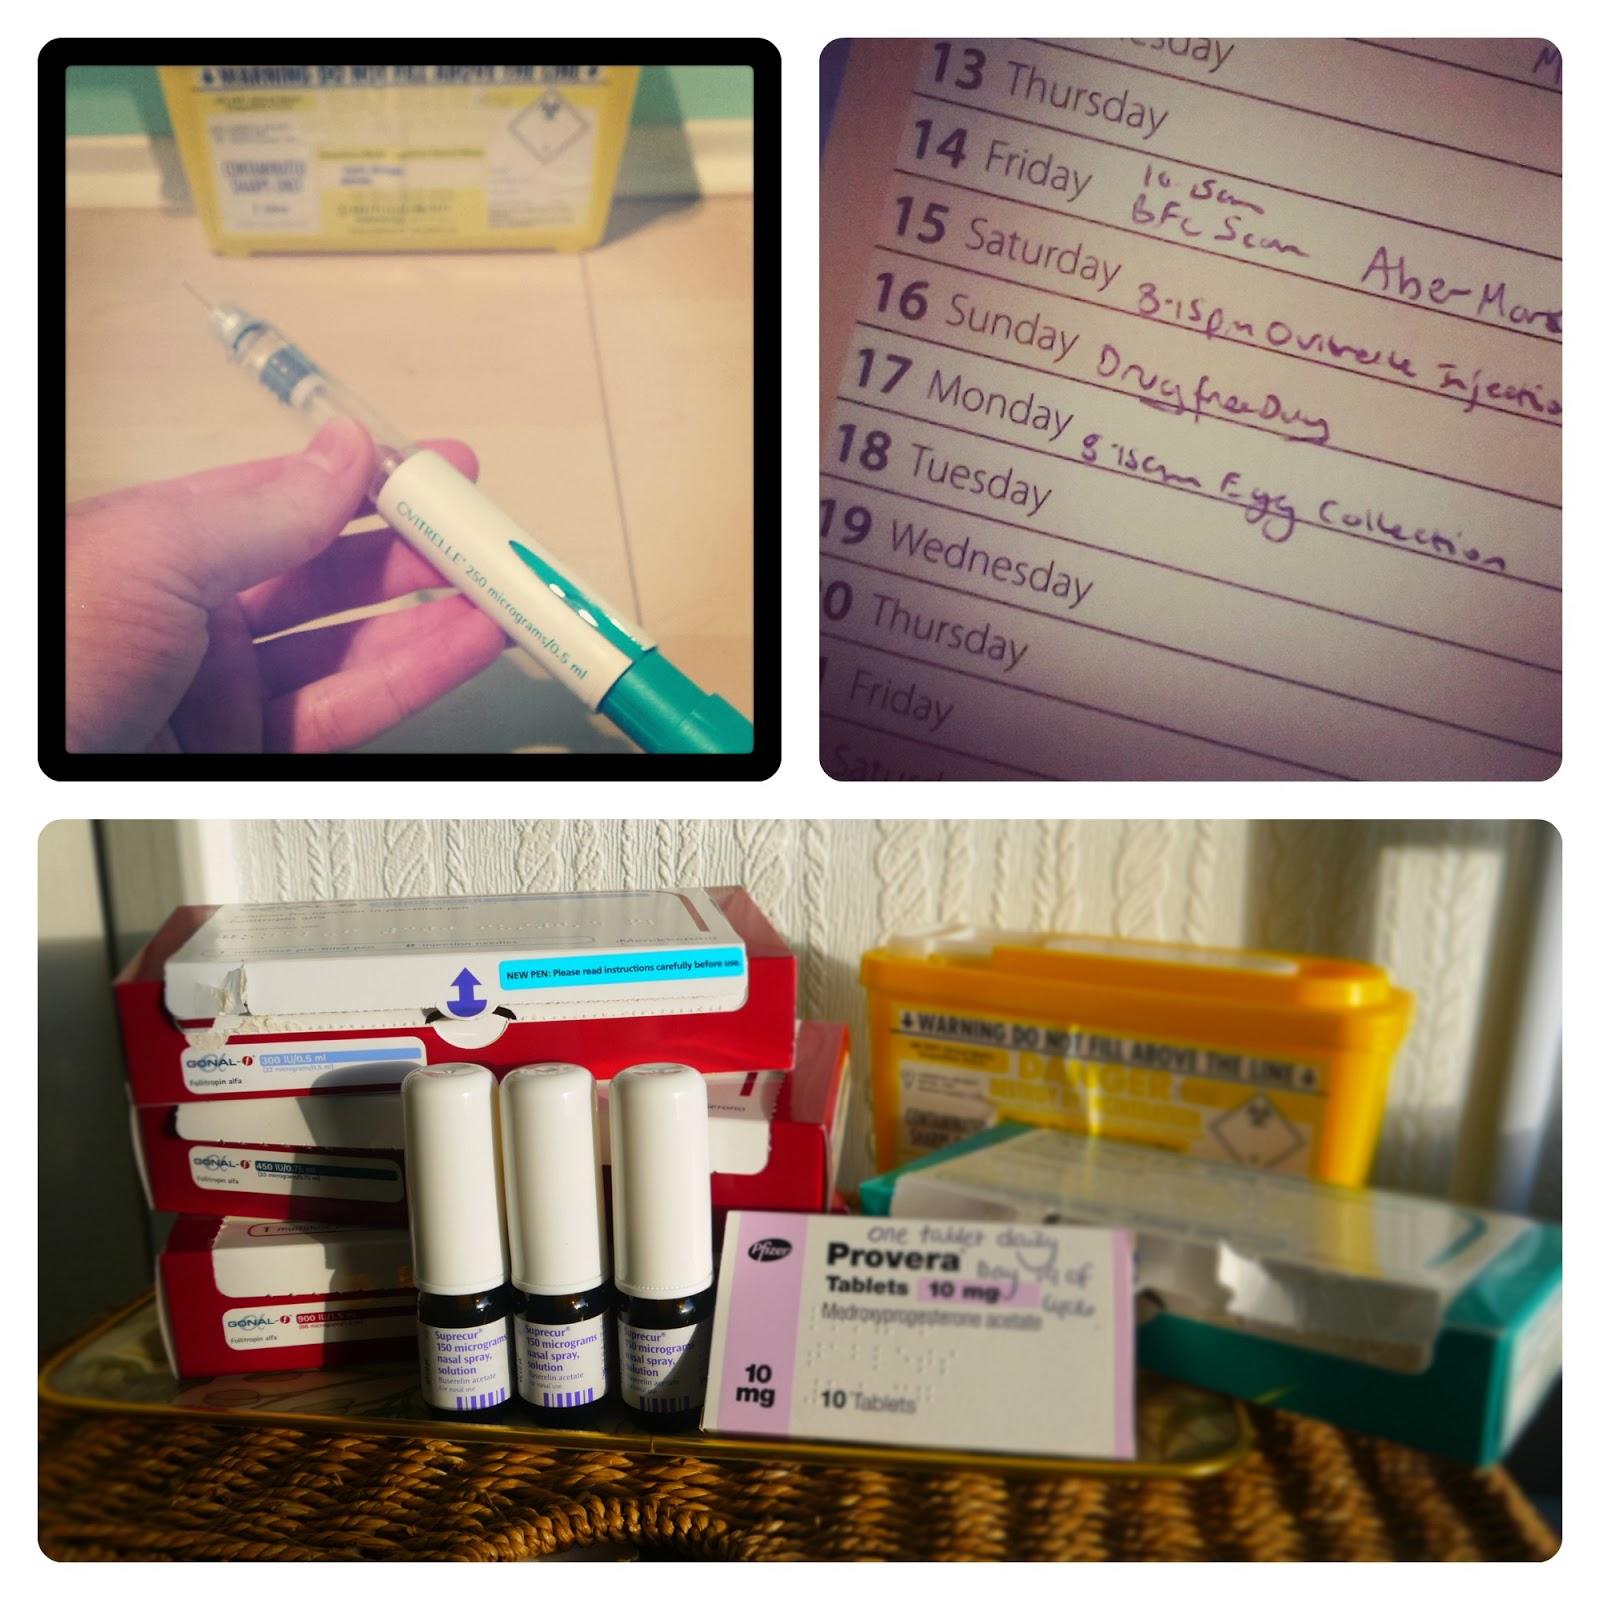 Final bit of IVF treatment